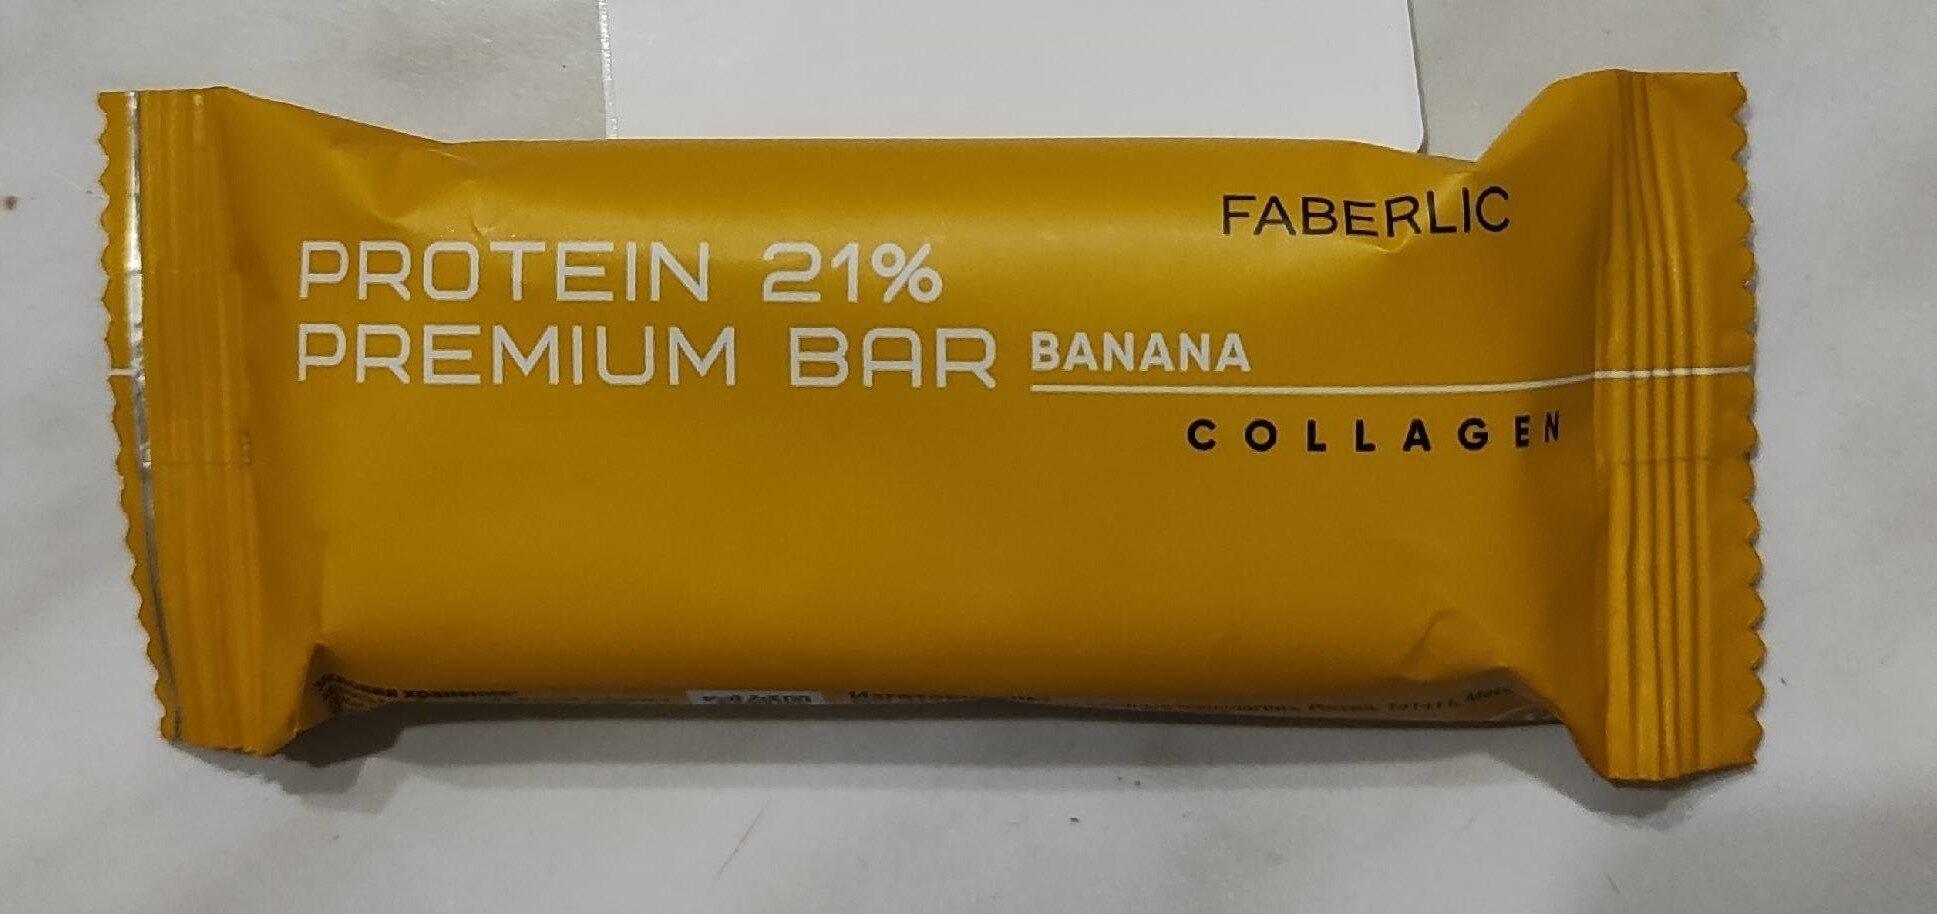 Premium bar banana - Product - it